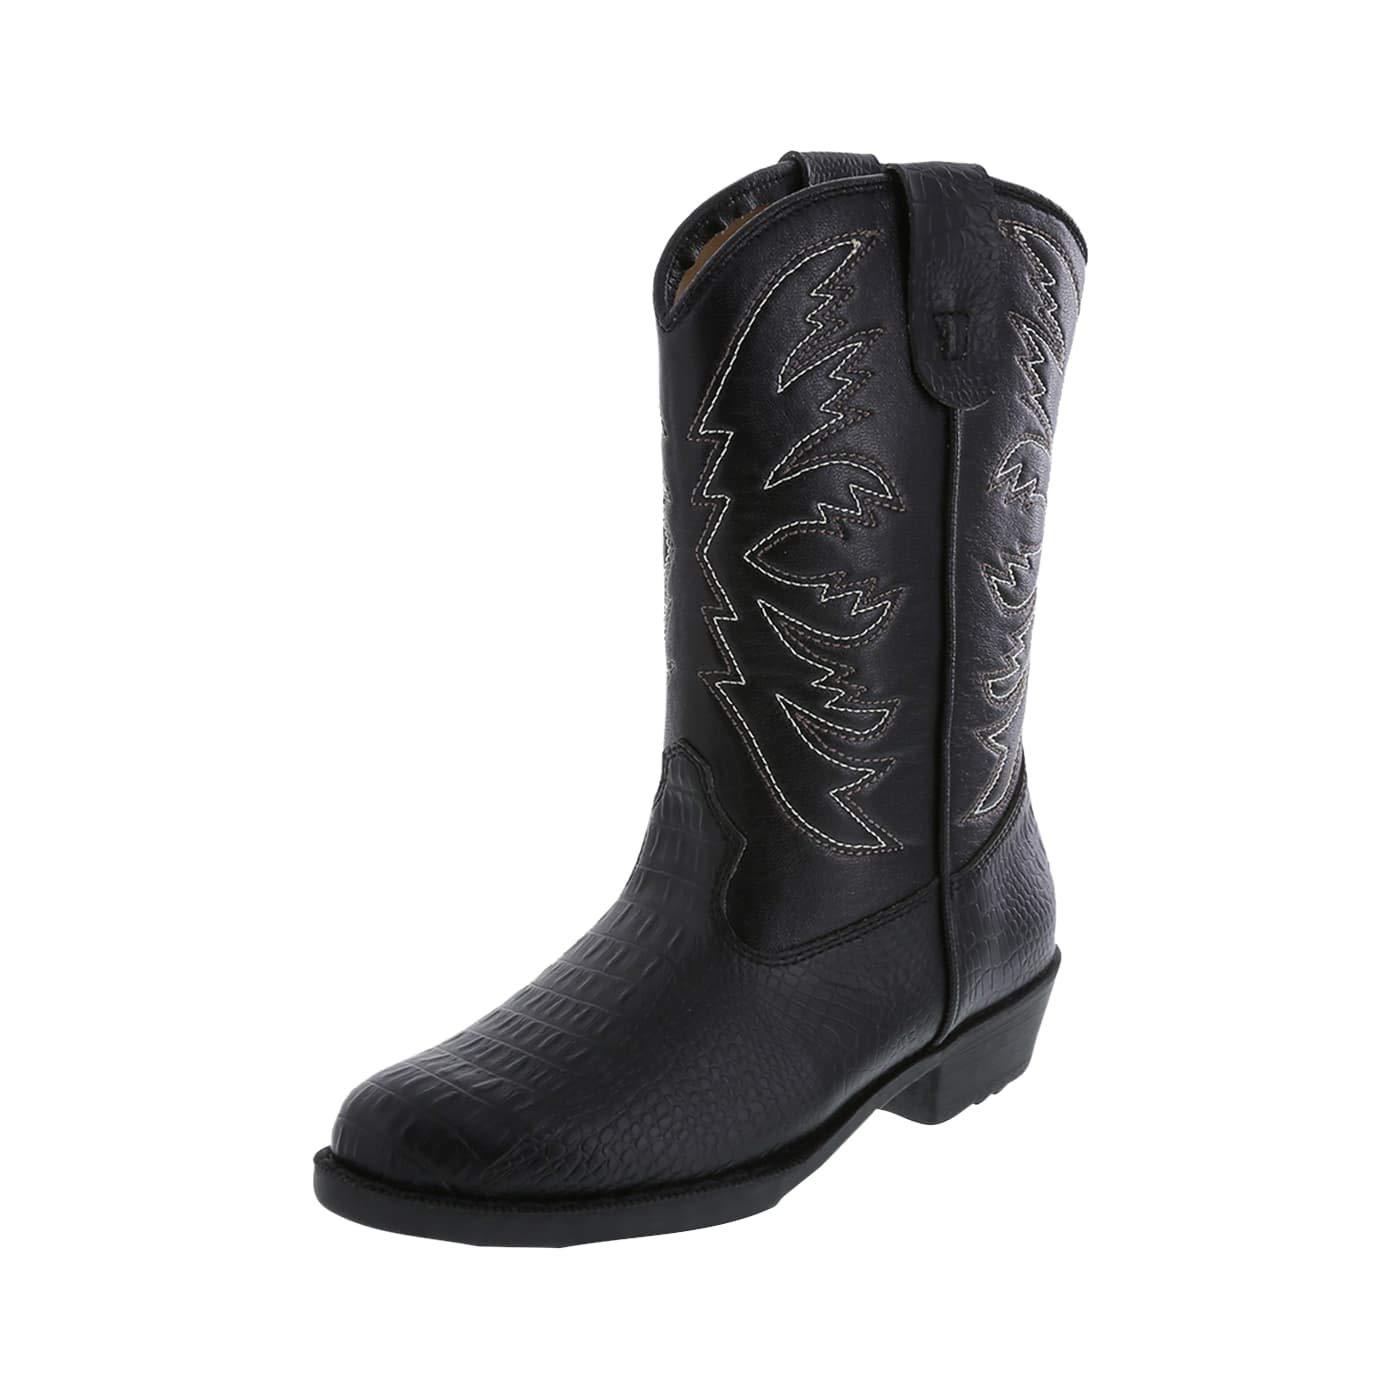 e0b76fdefcd SmartFit Kids' Western Boots